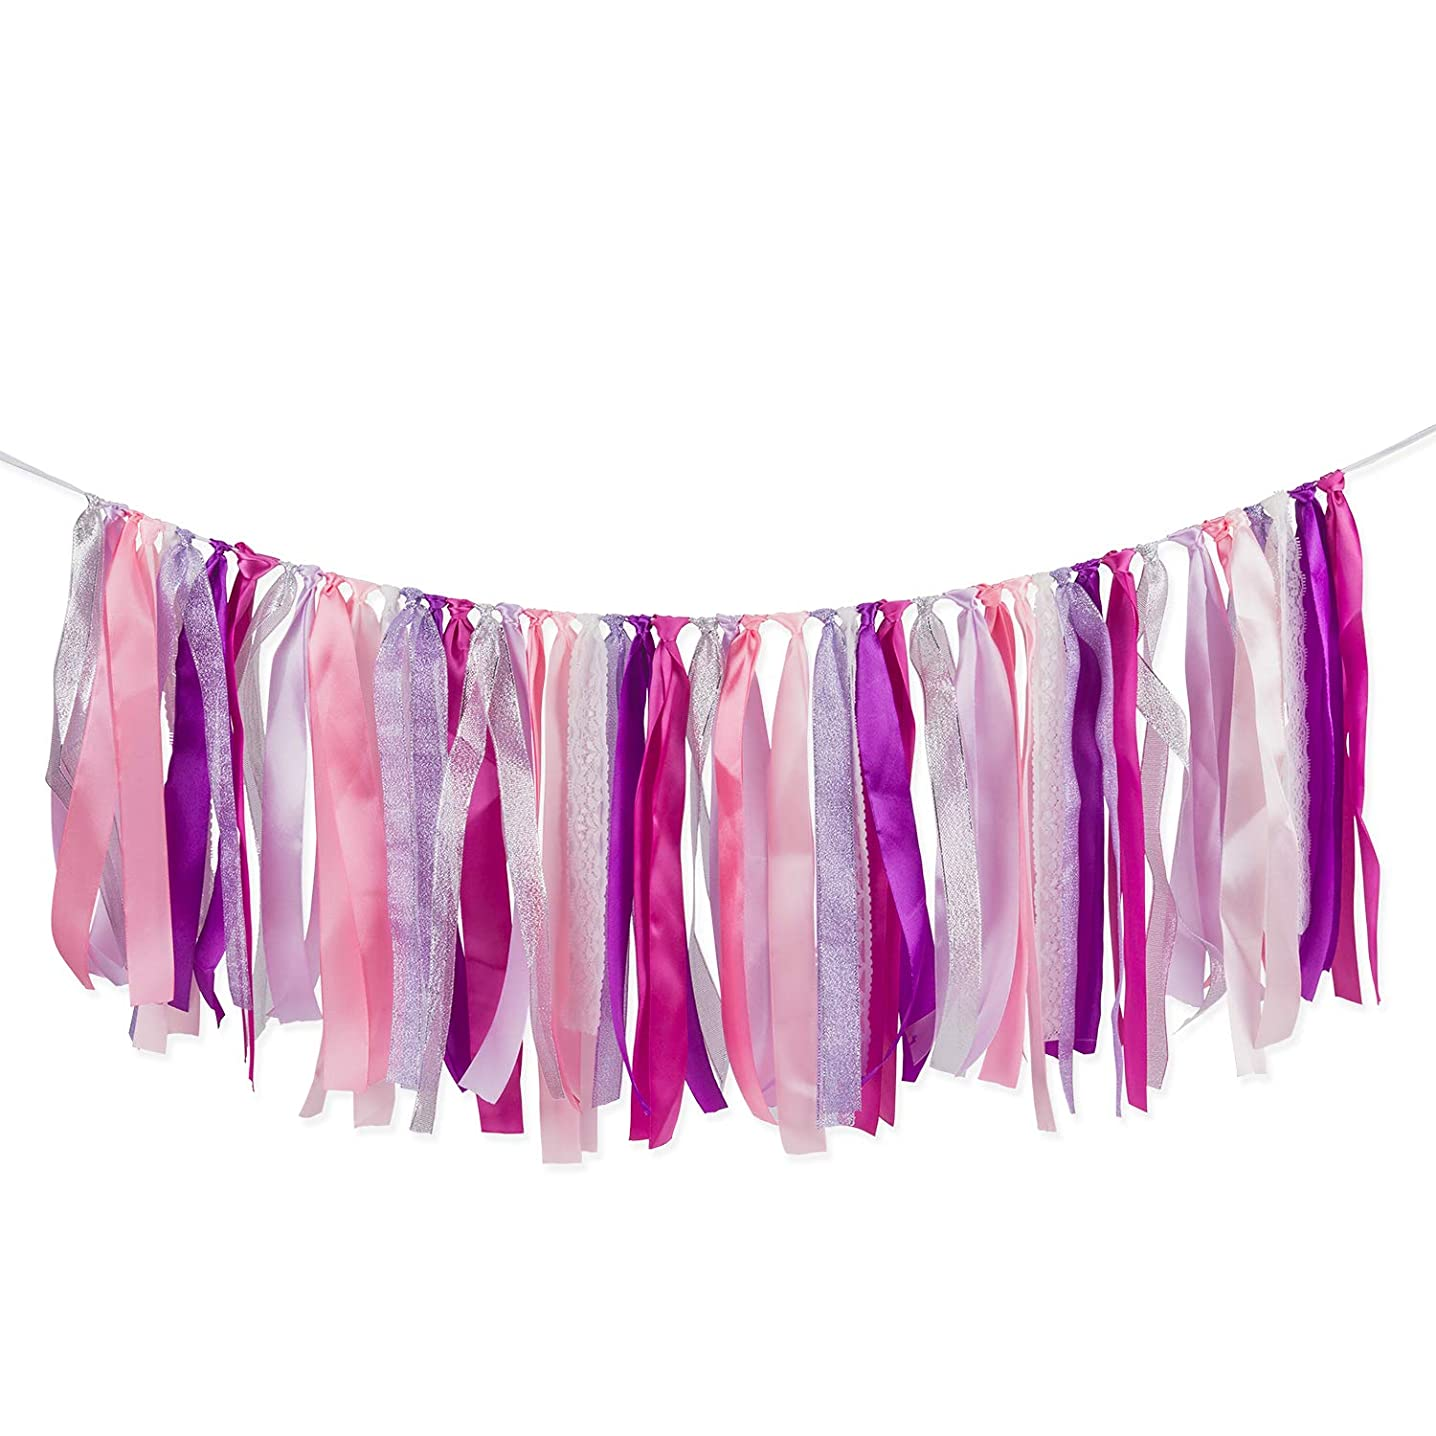 LaRibbons Vibrant Ribbon Tassel Garland - Handmade Fabric Banner Hanging Decor for Wedding Party Supplies - Purple